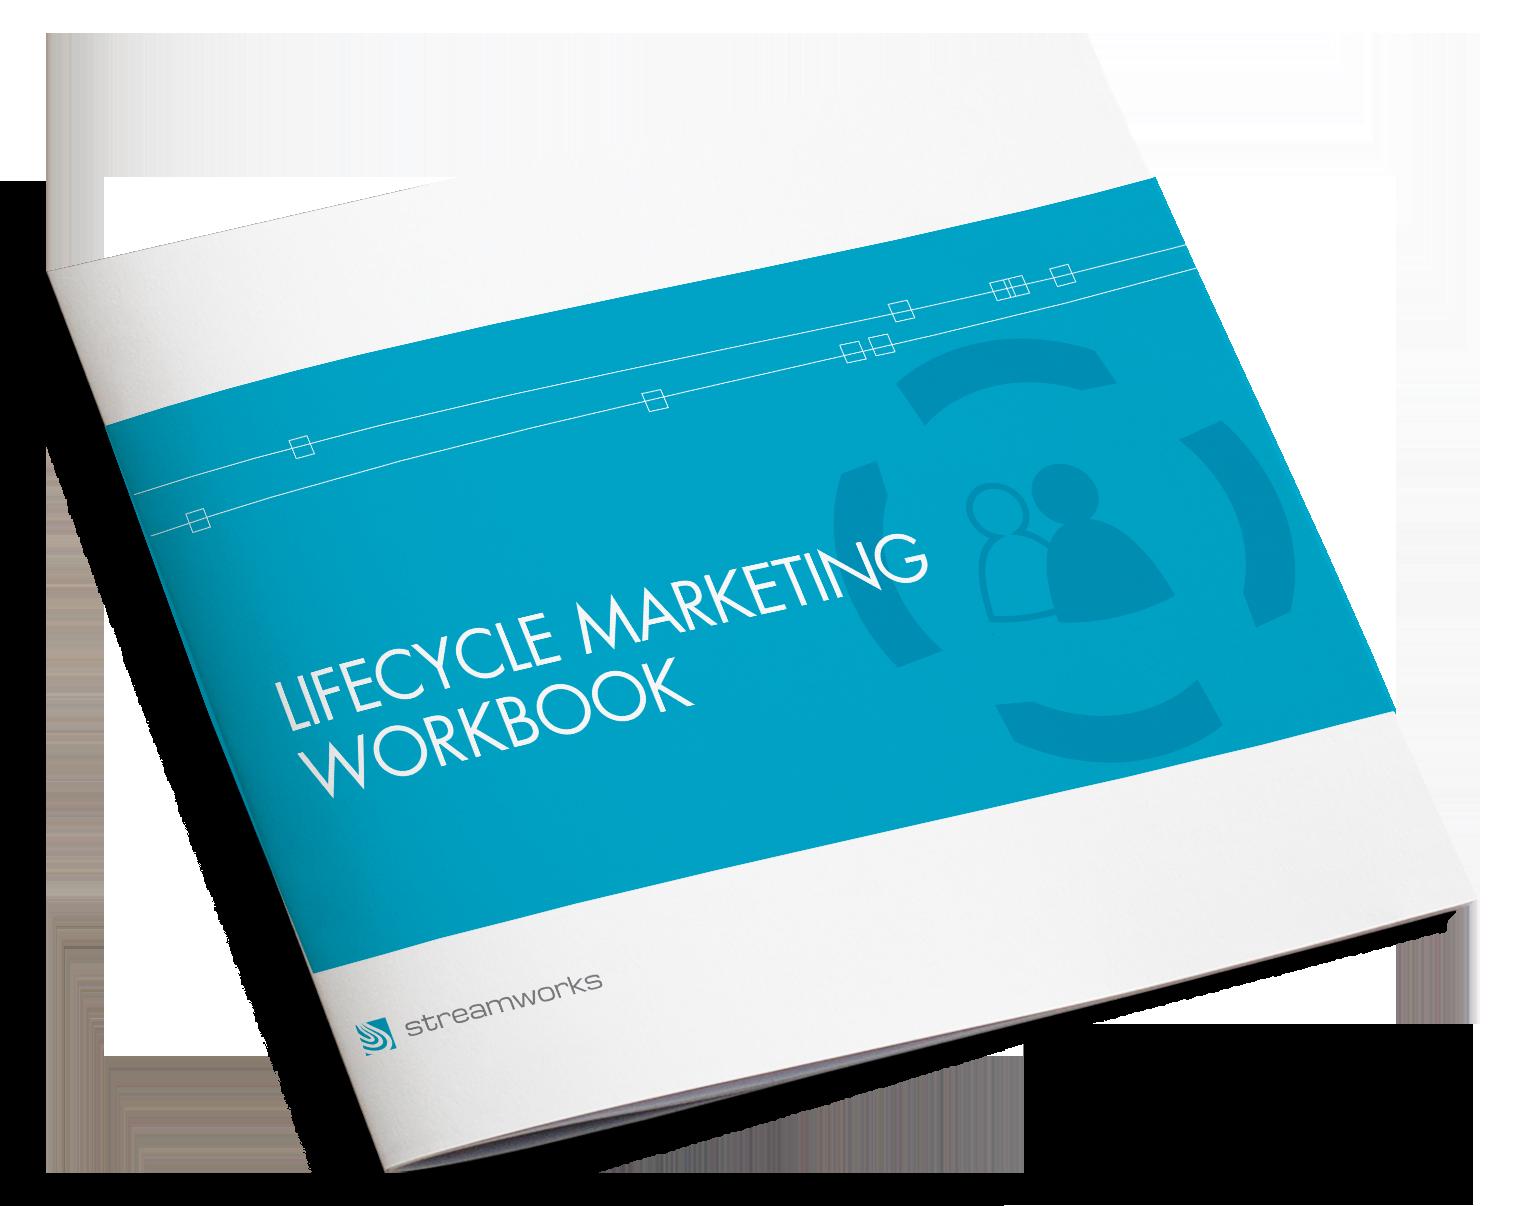 Lifecycle Marketing Workbook